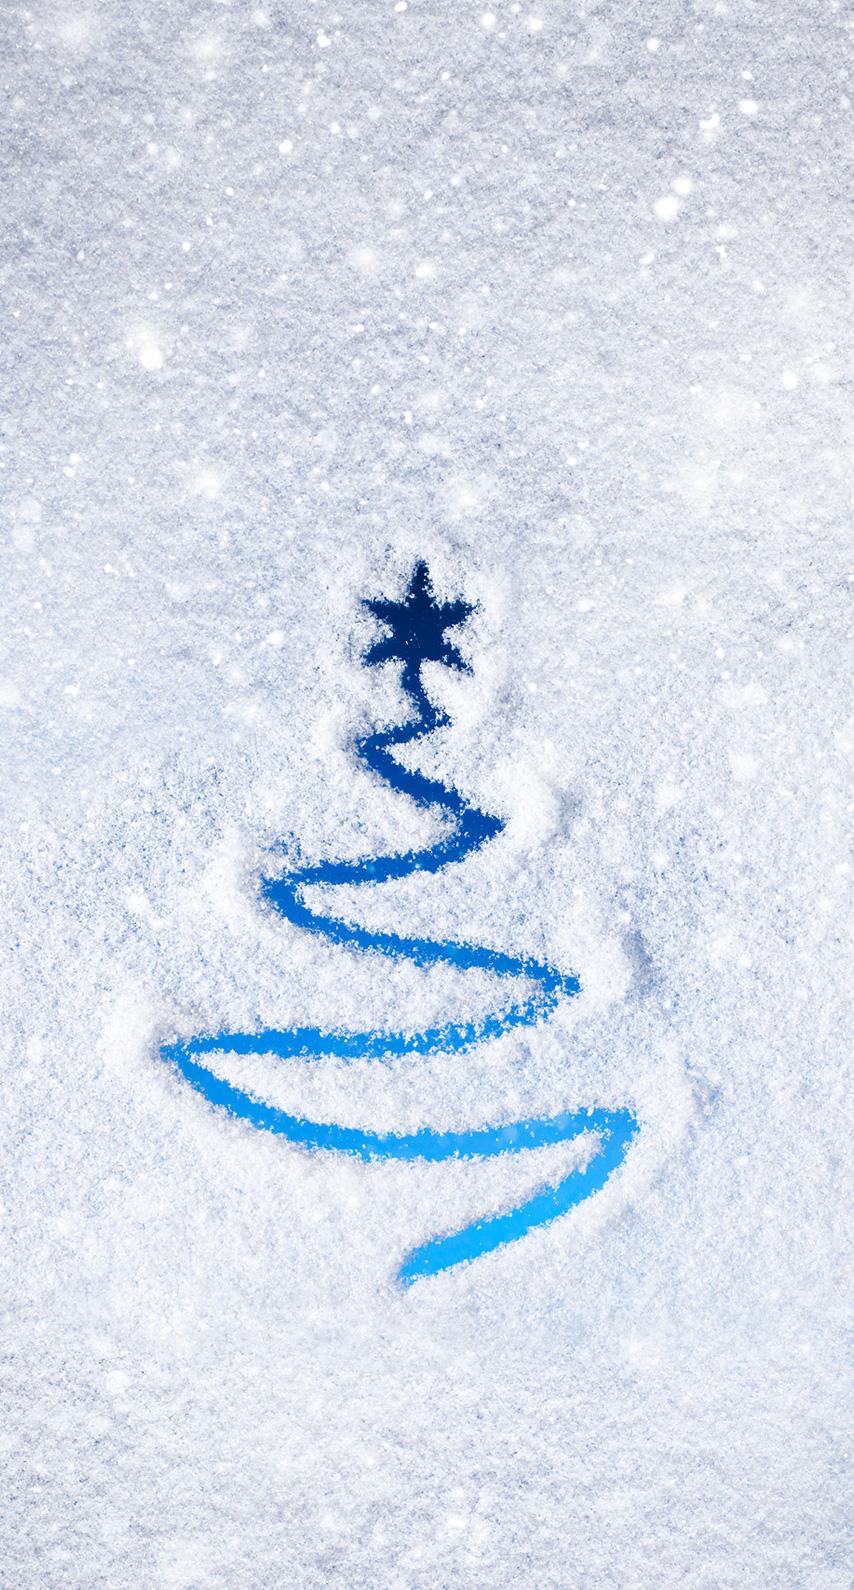 icee, snow-white